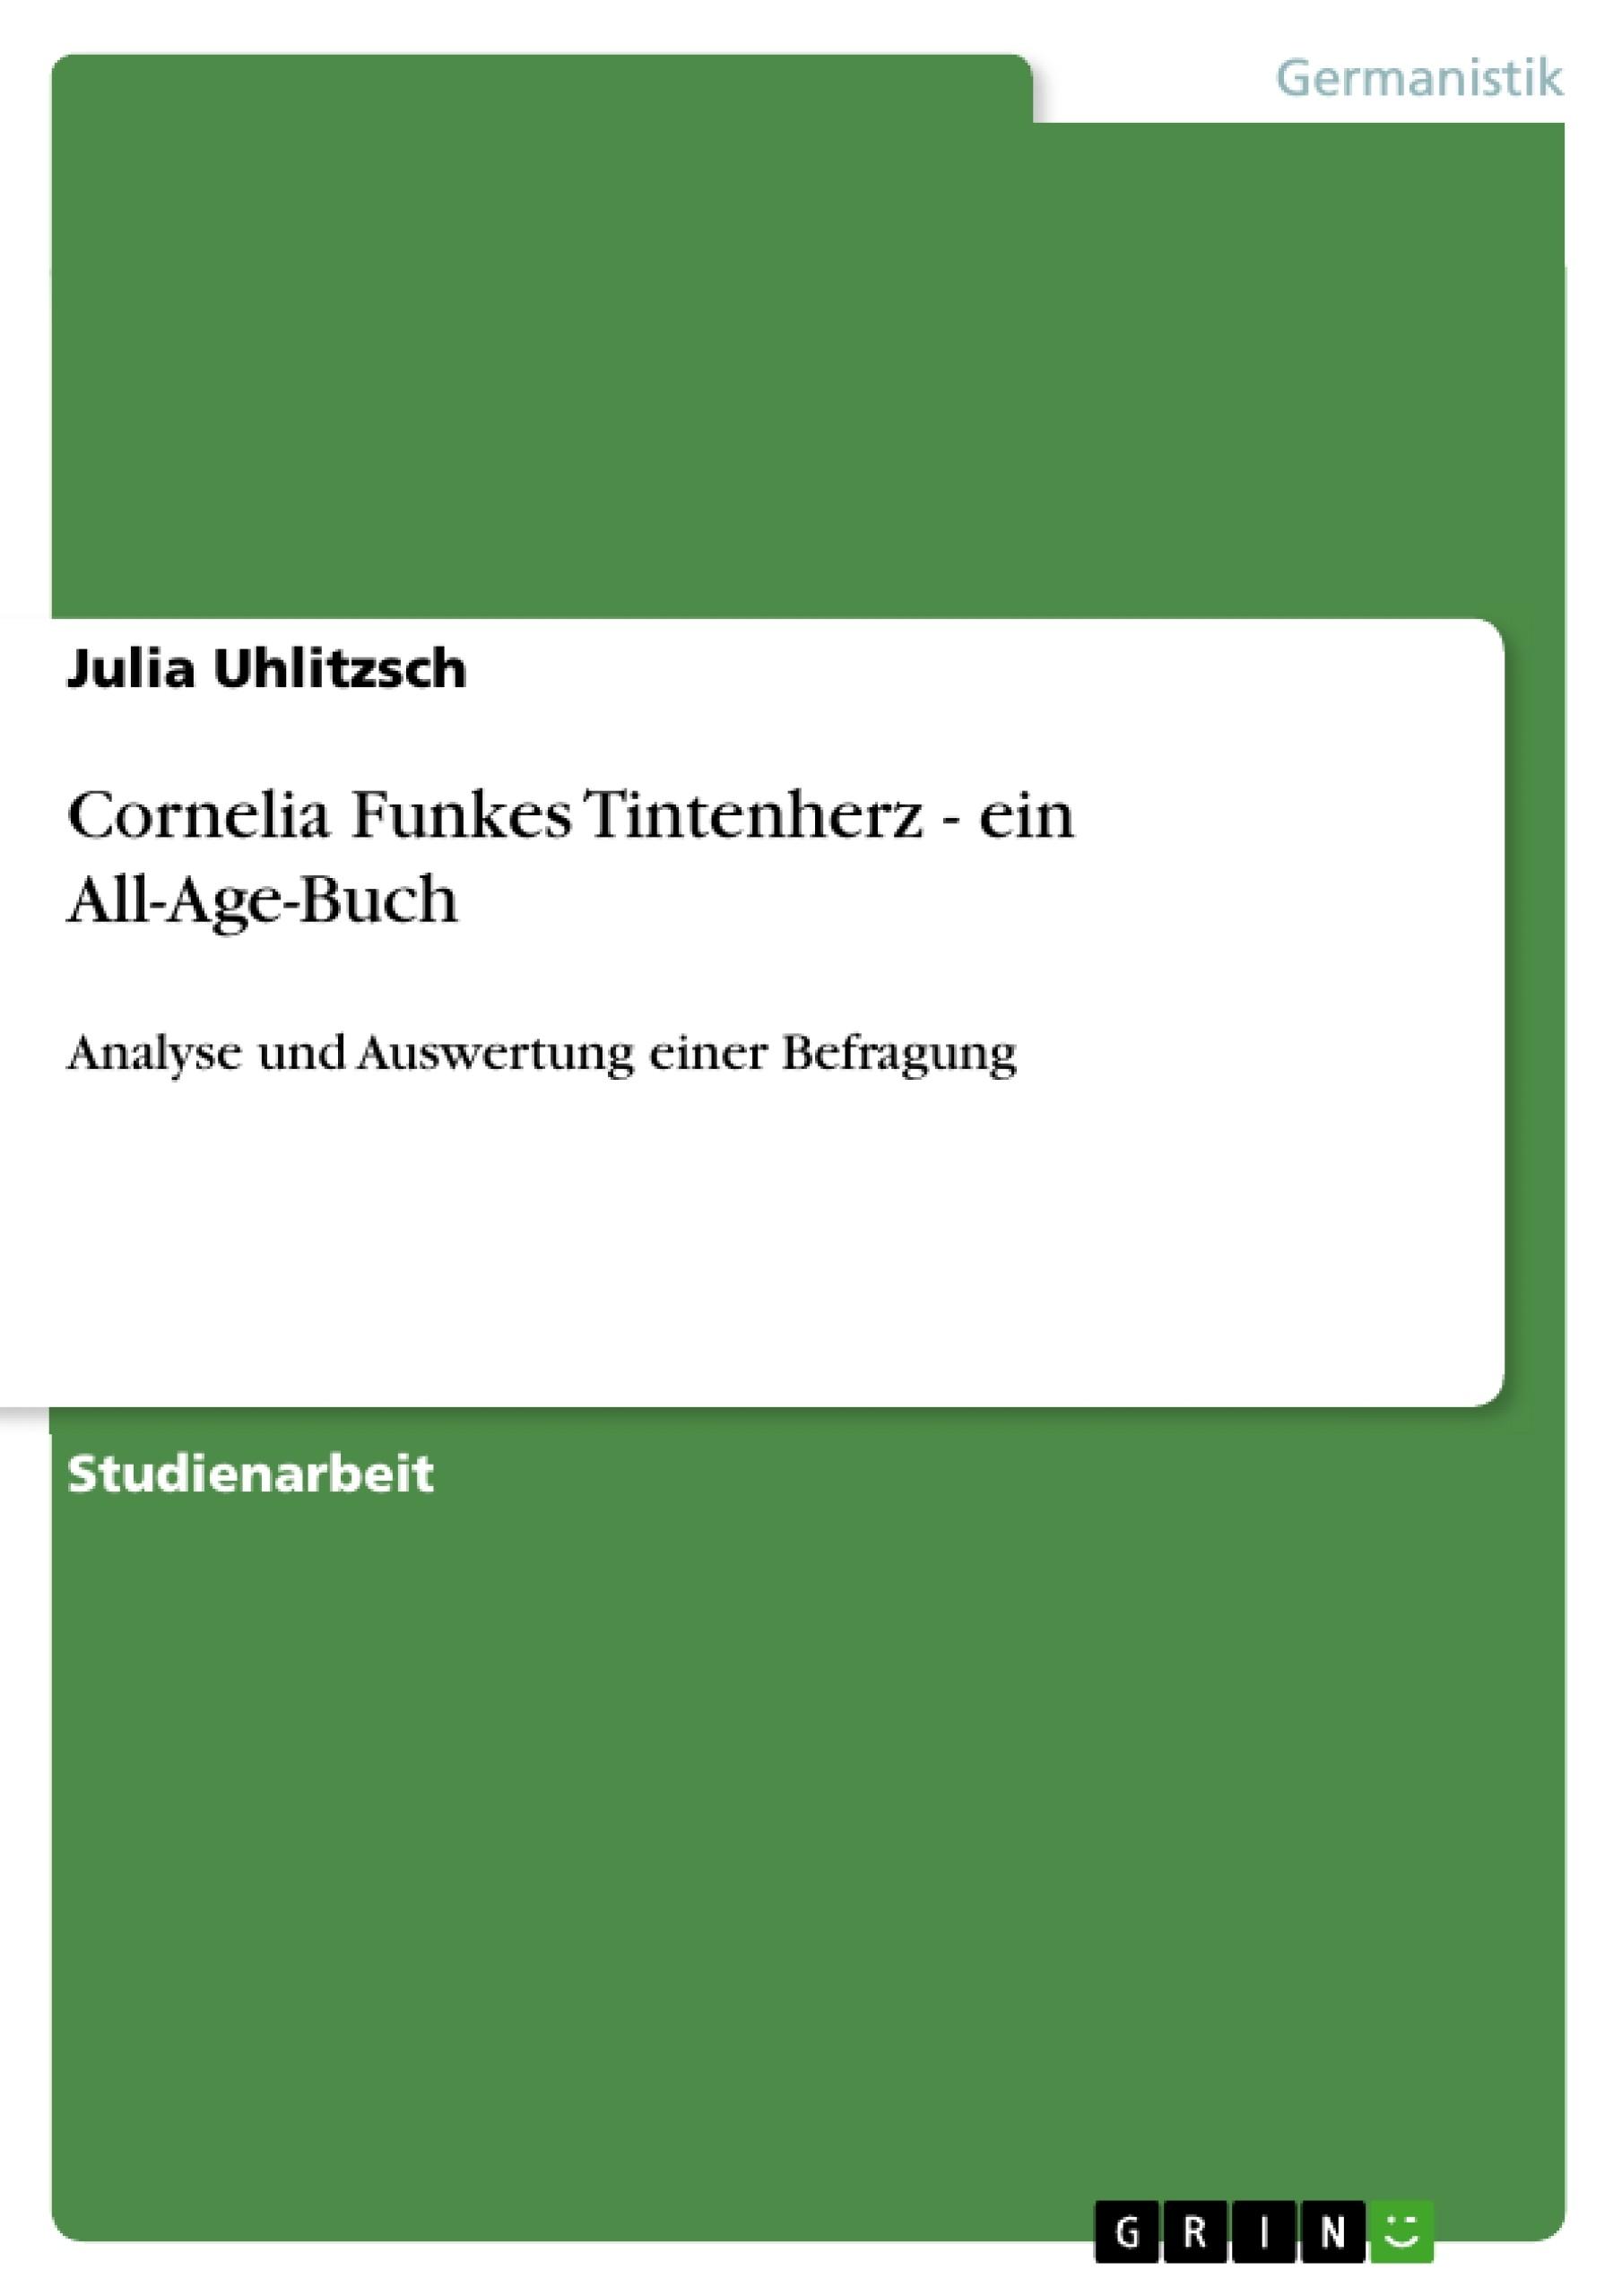 Titel: Cornelia Funkes Tintenherz - ein All-Age-Buch